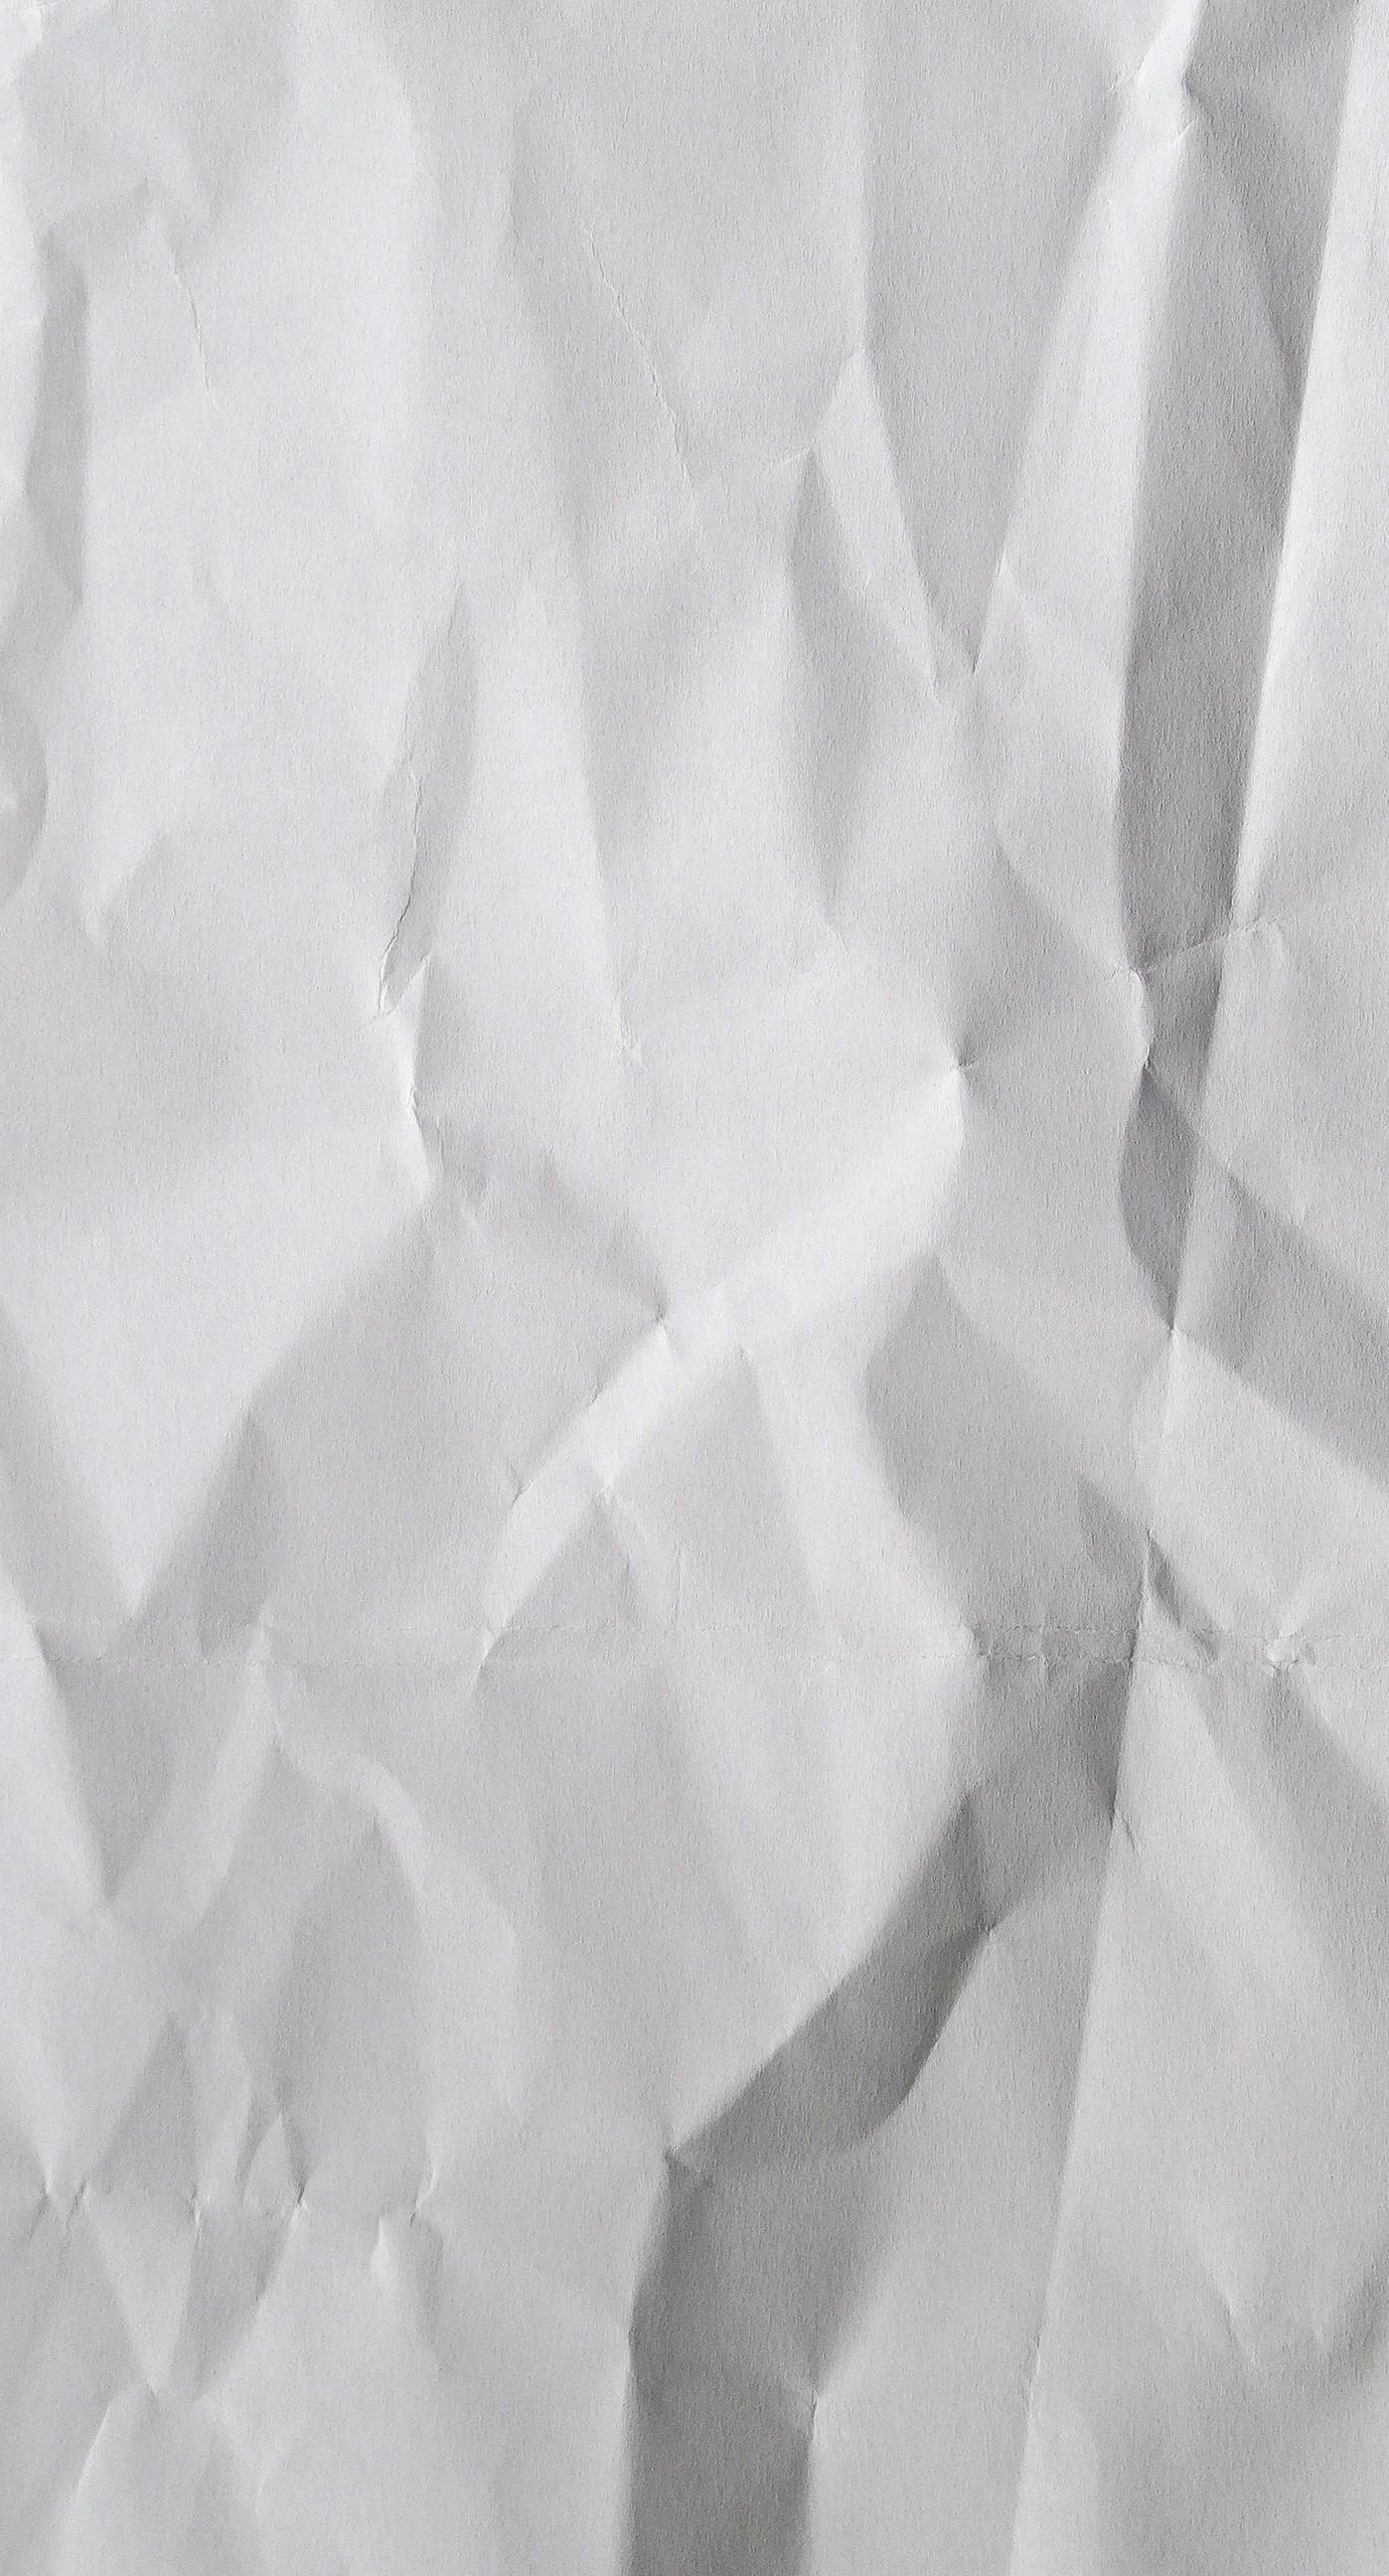 Iphone 6 Paper Wallpaper